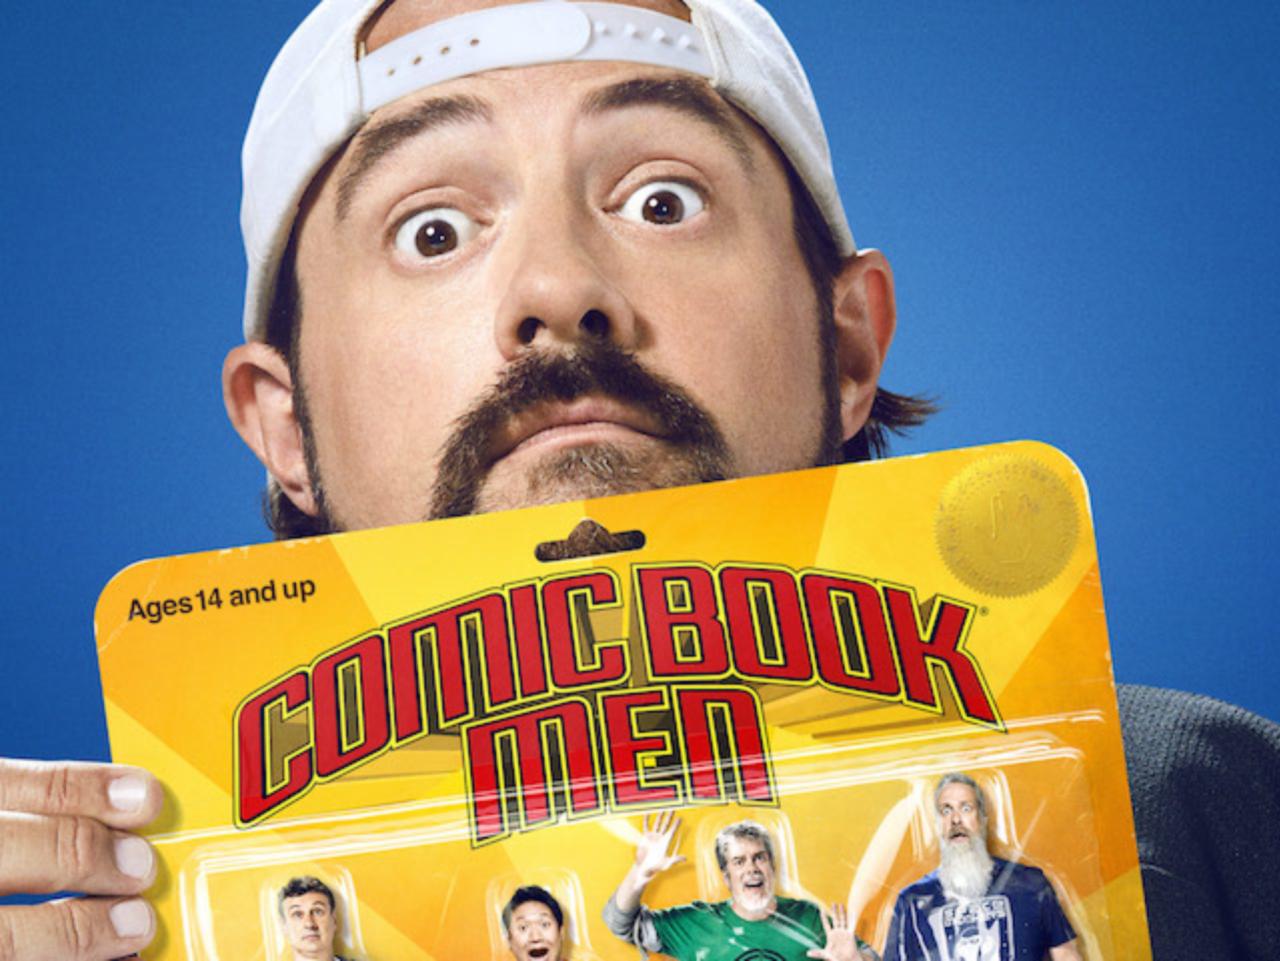 kevin-smith-comic-book-men-1021365-1280x0.jpg